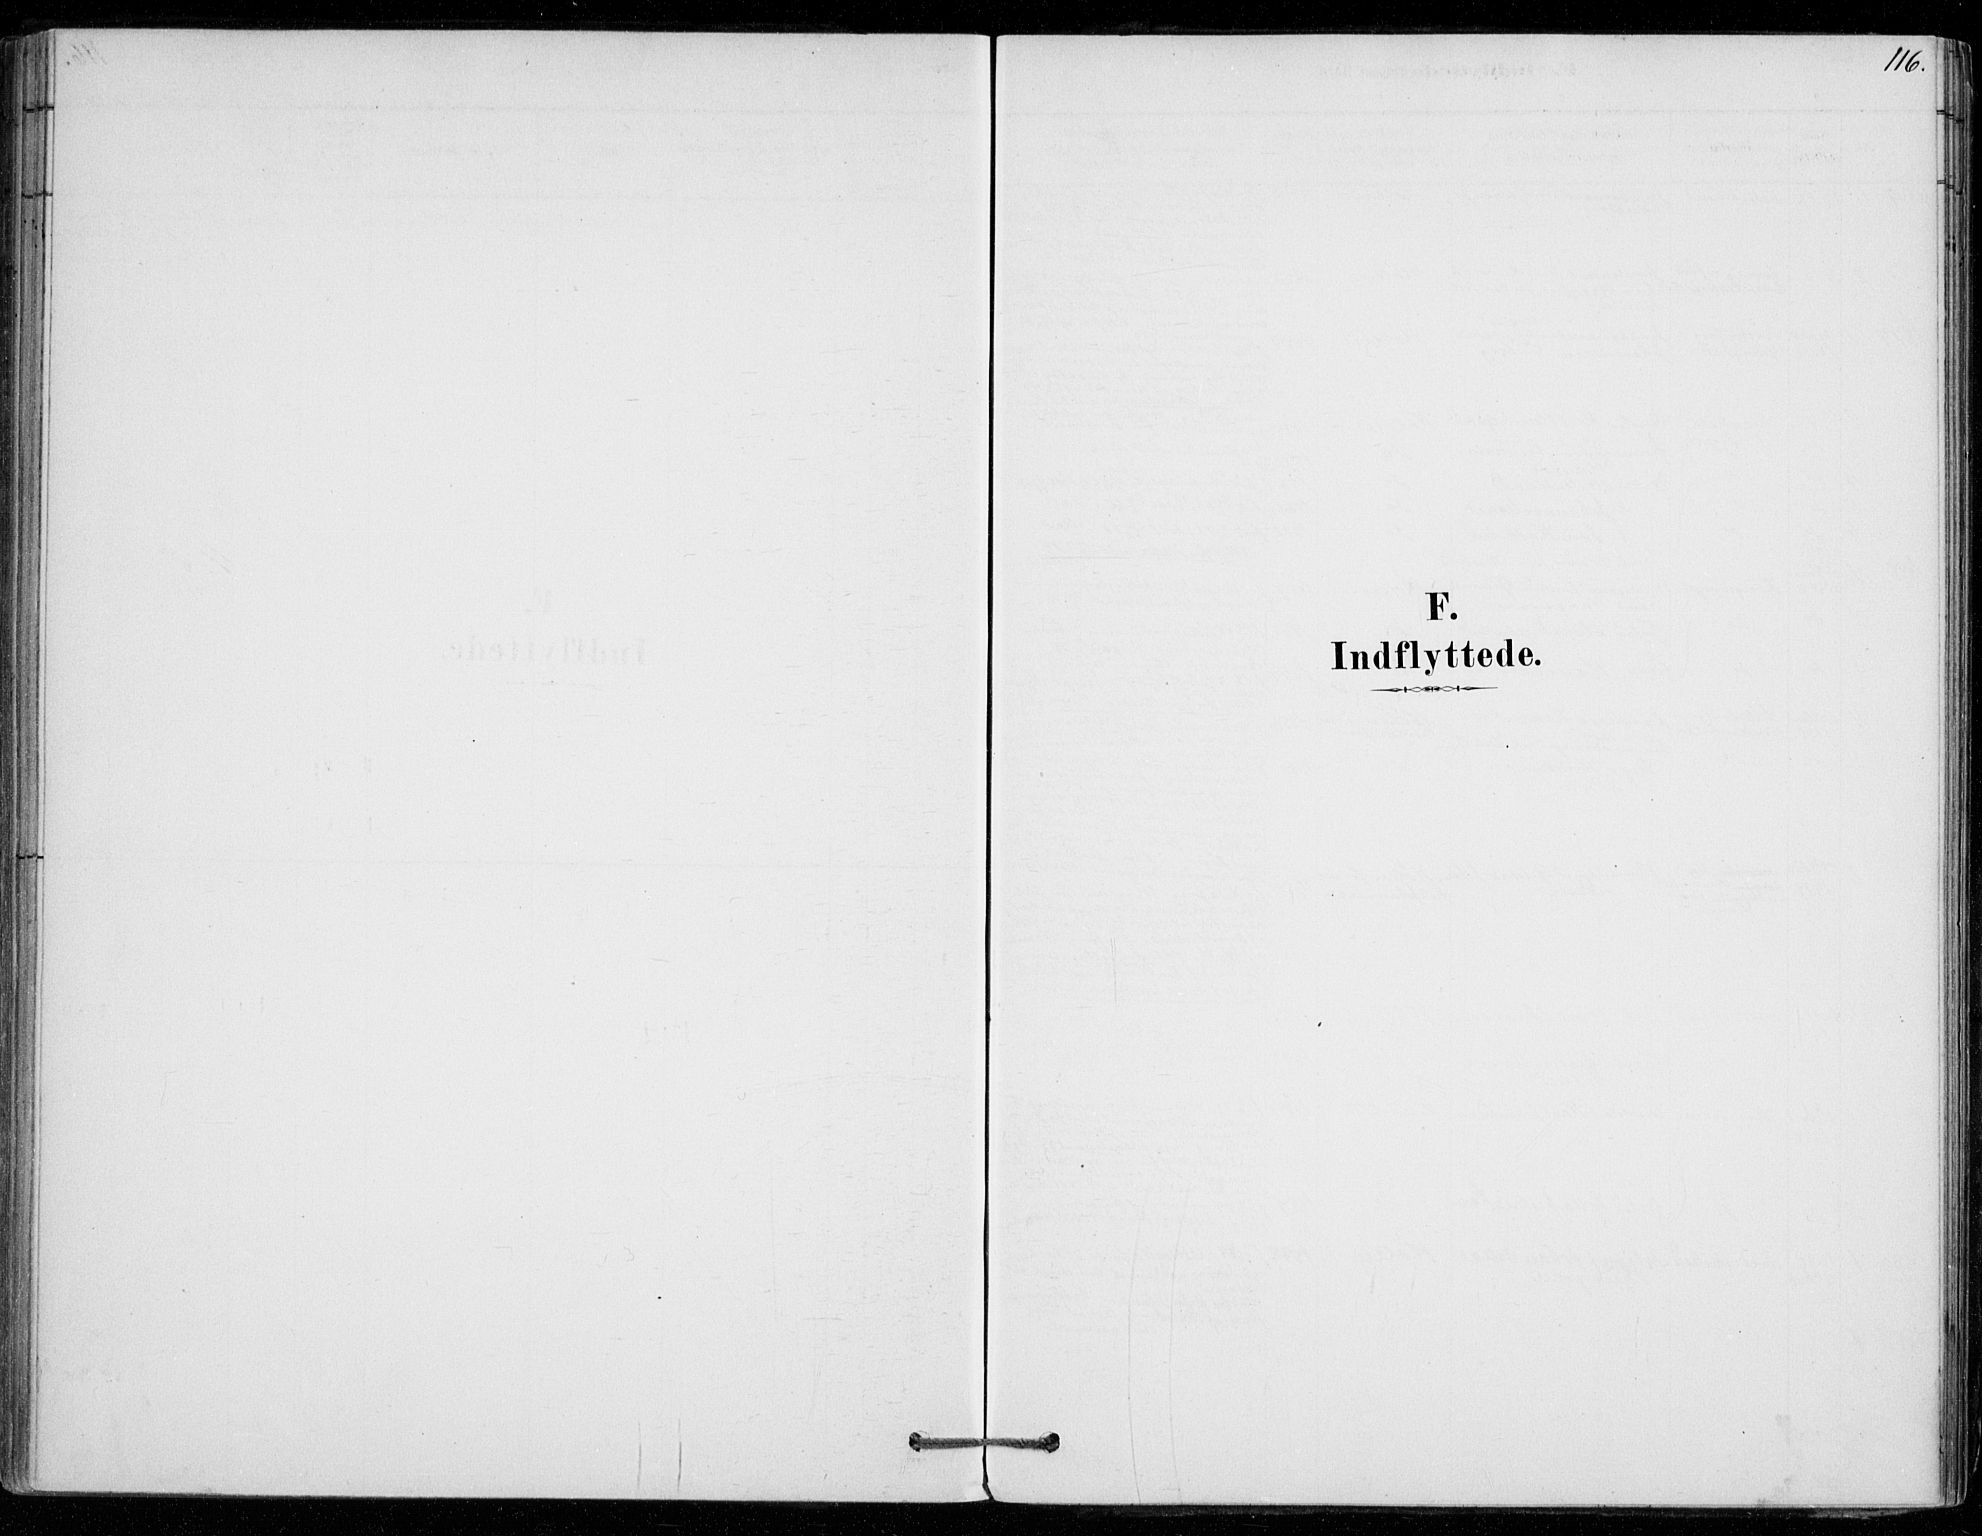 SAO, Vestby prestekontor Kirkebøker, F/Fe/L0001: Ministerialbok nr. V 1, 1878-1931, s. 116